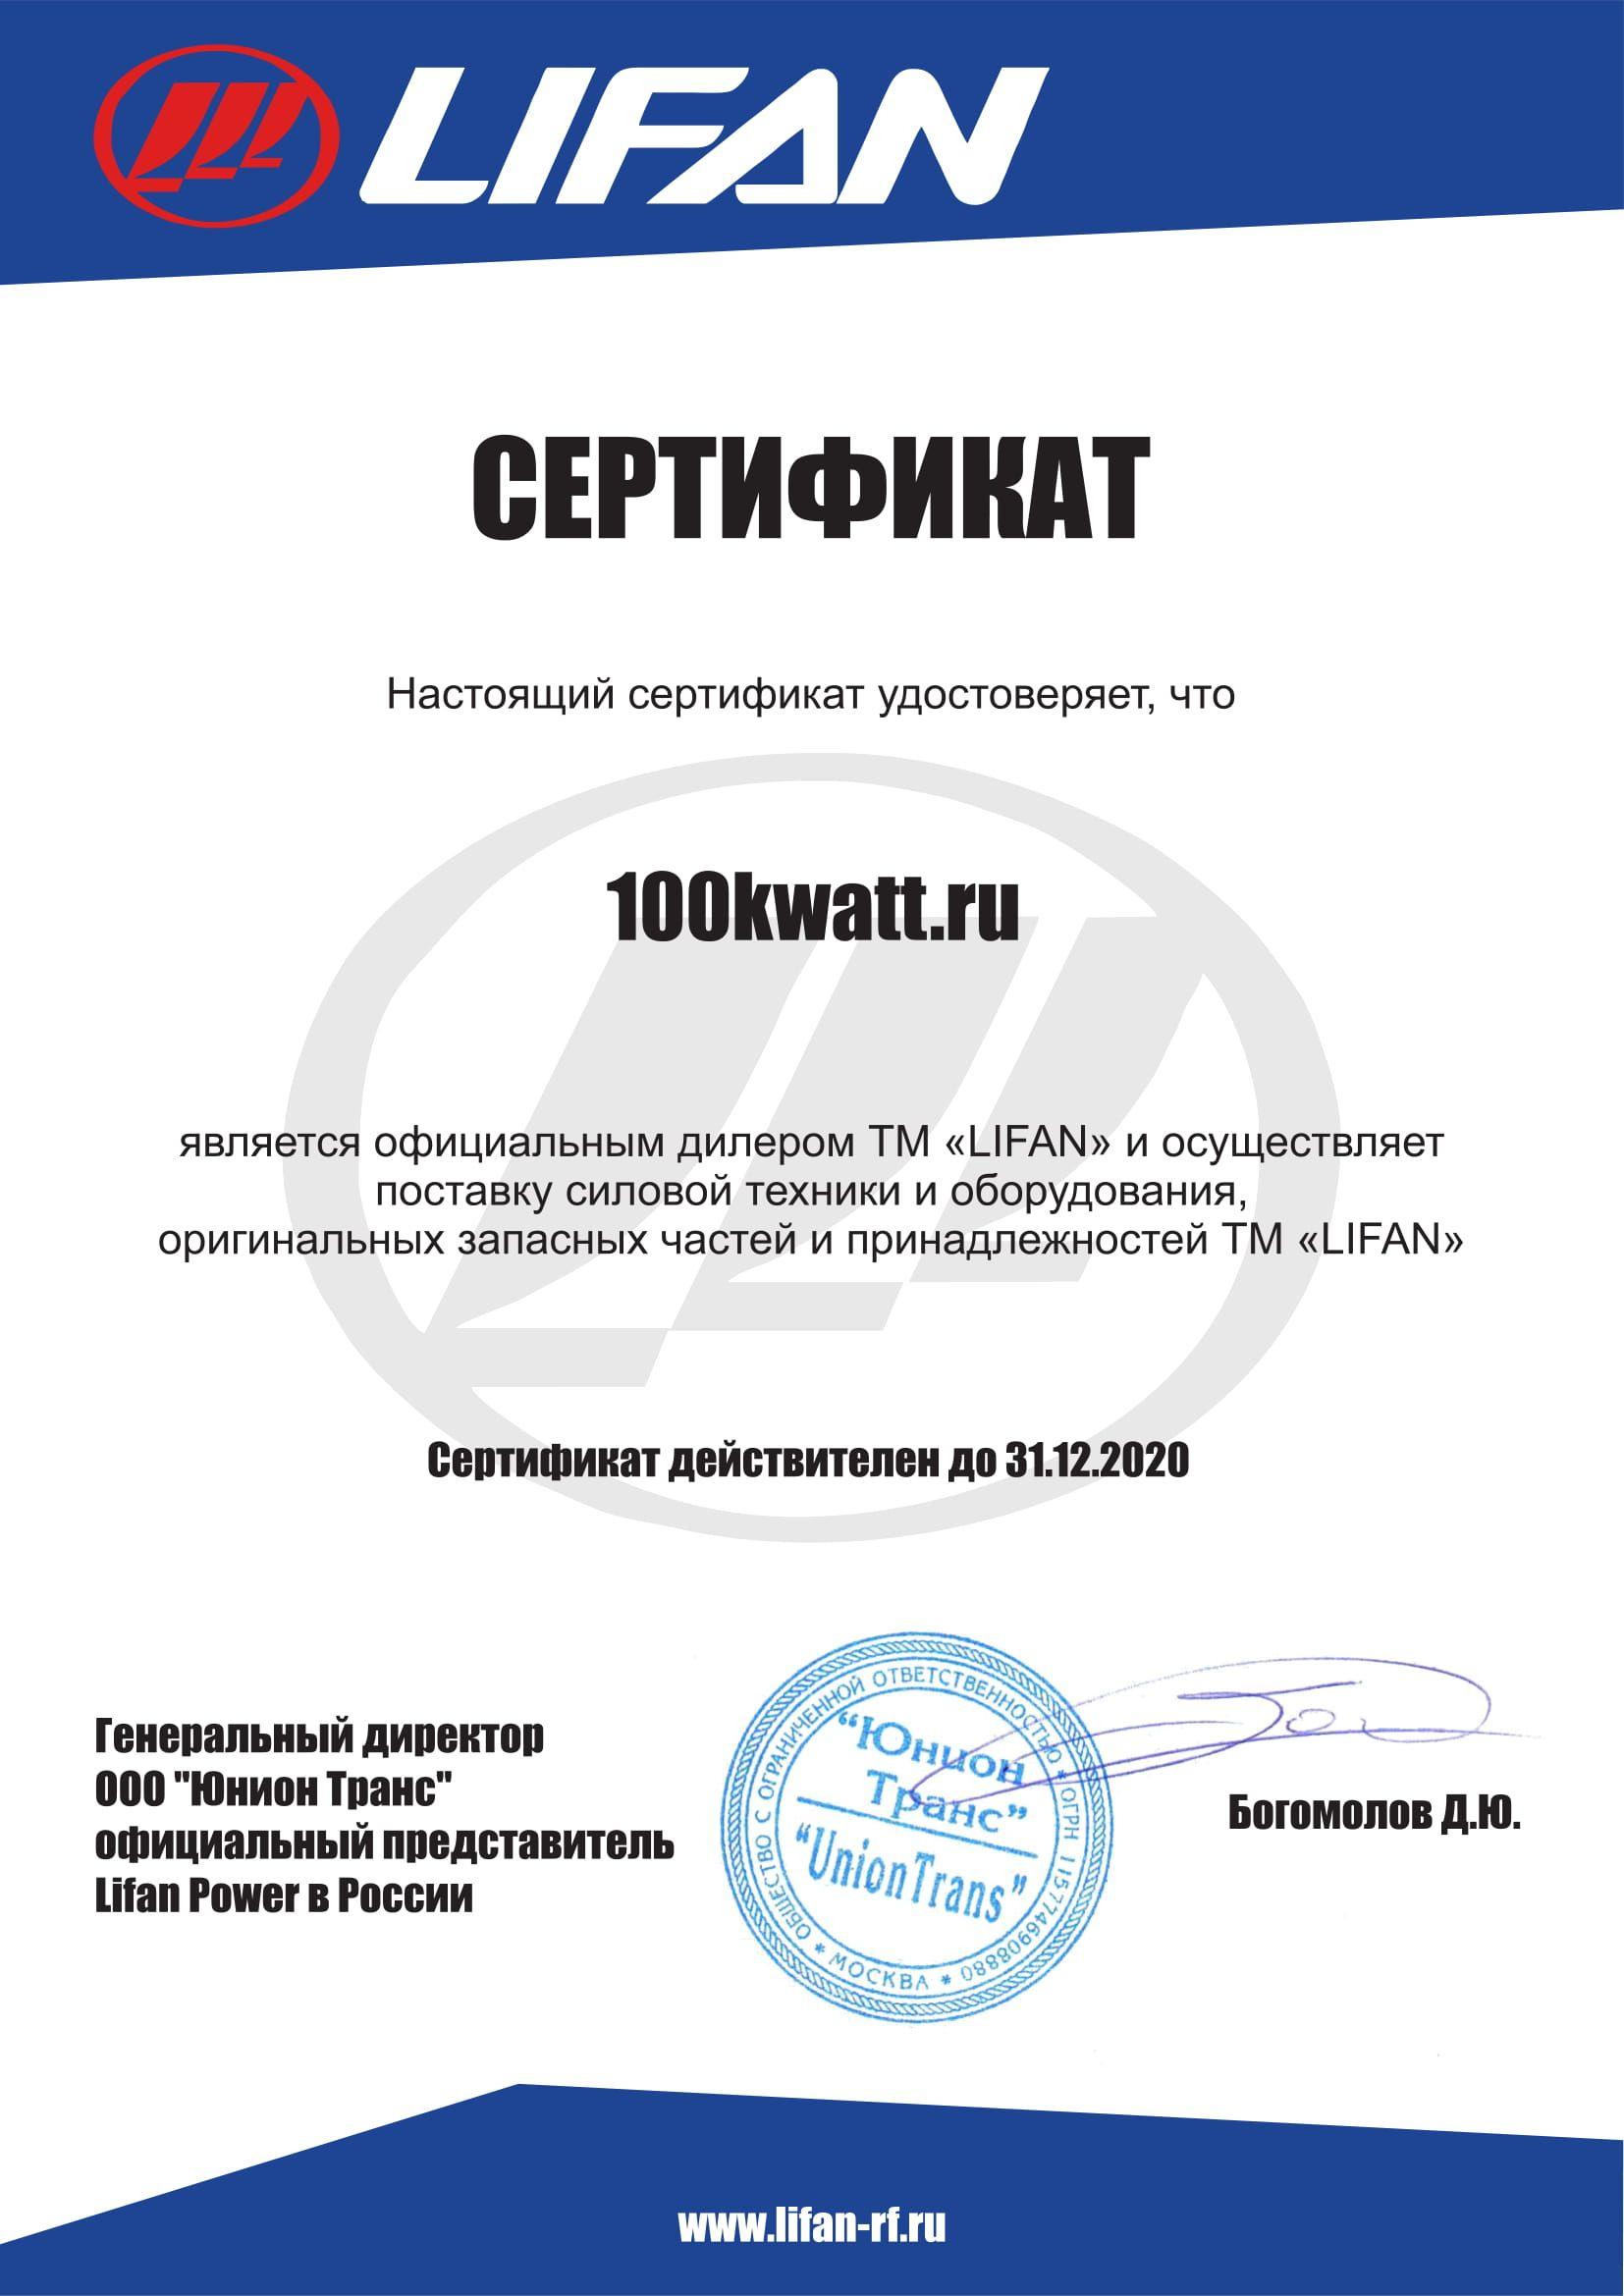 LIFAN - Сертификат дилера